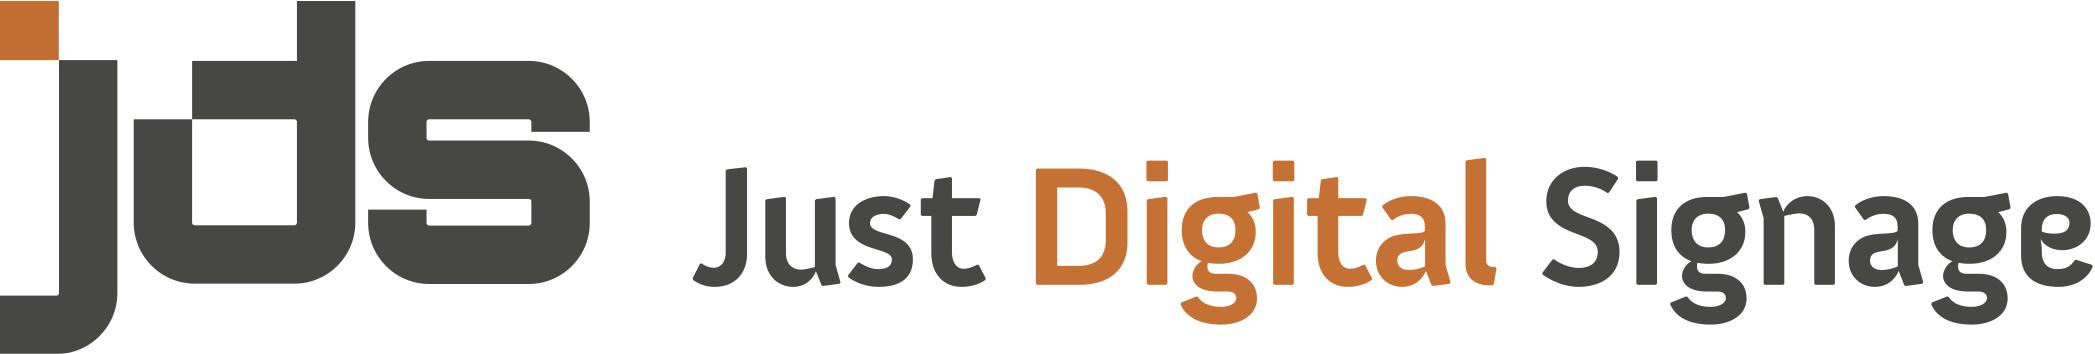 Just Digital Signage